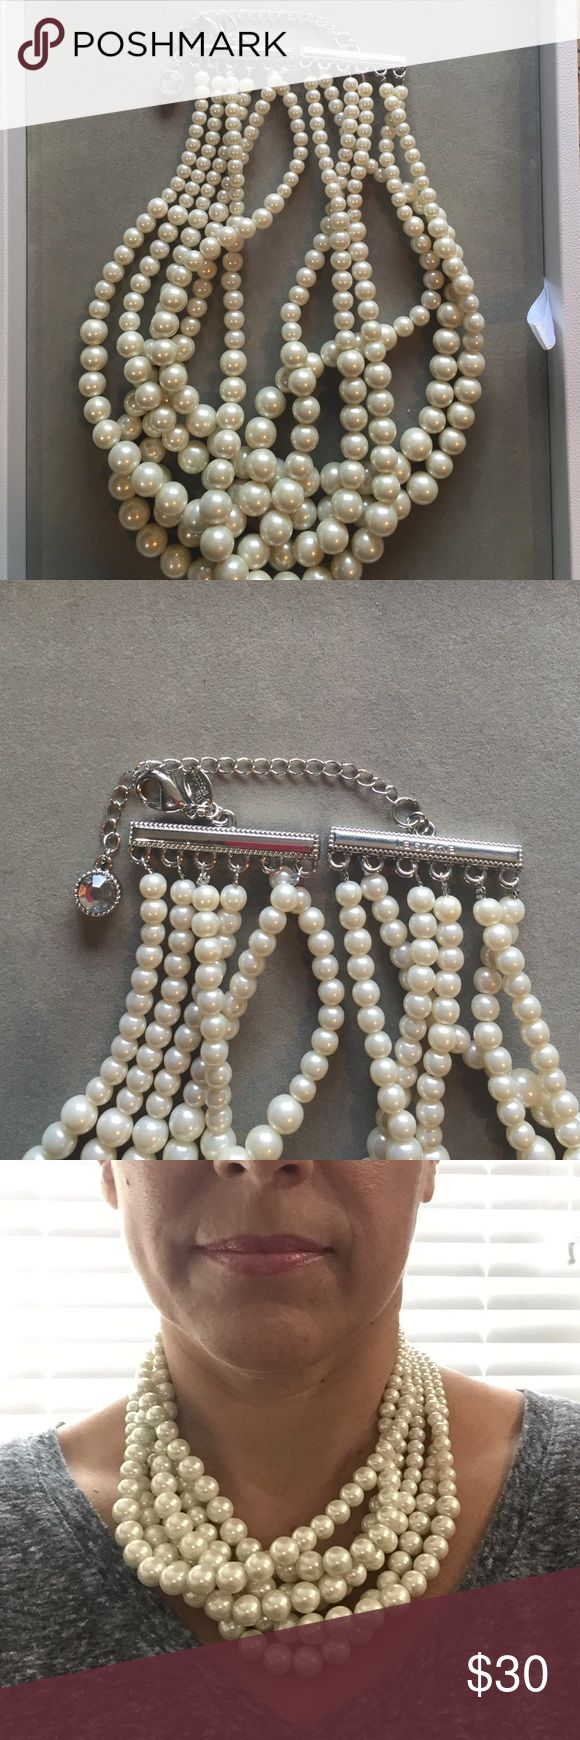 "Lia Sophia necklace Adjustable 17""-20"" six-strand necklace by Lia Sophia Lia Sophia Jewelry Necklaces"